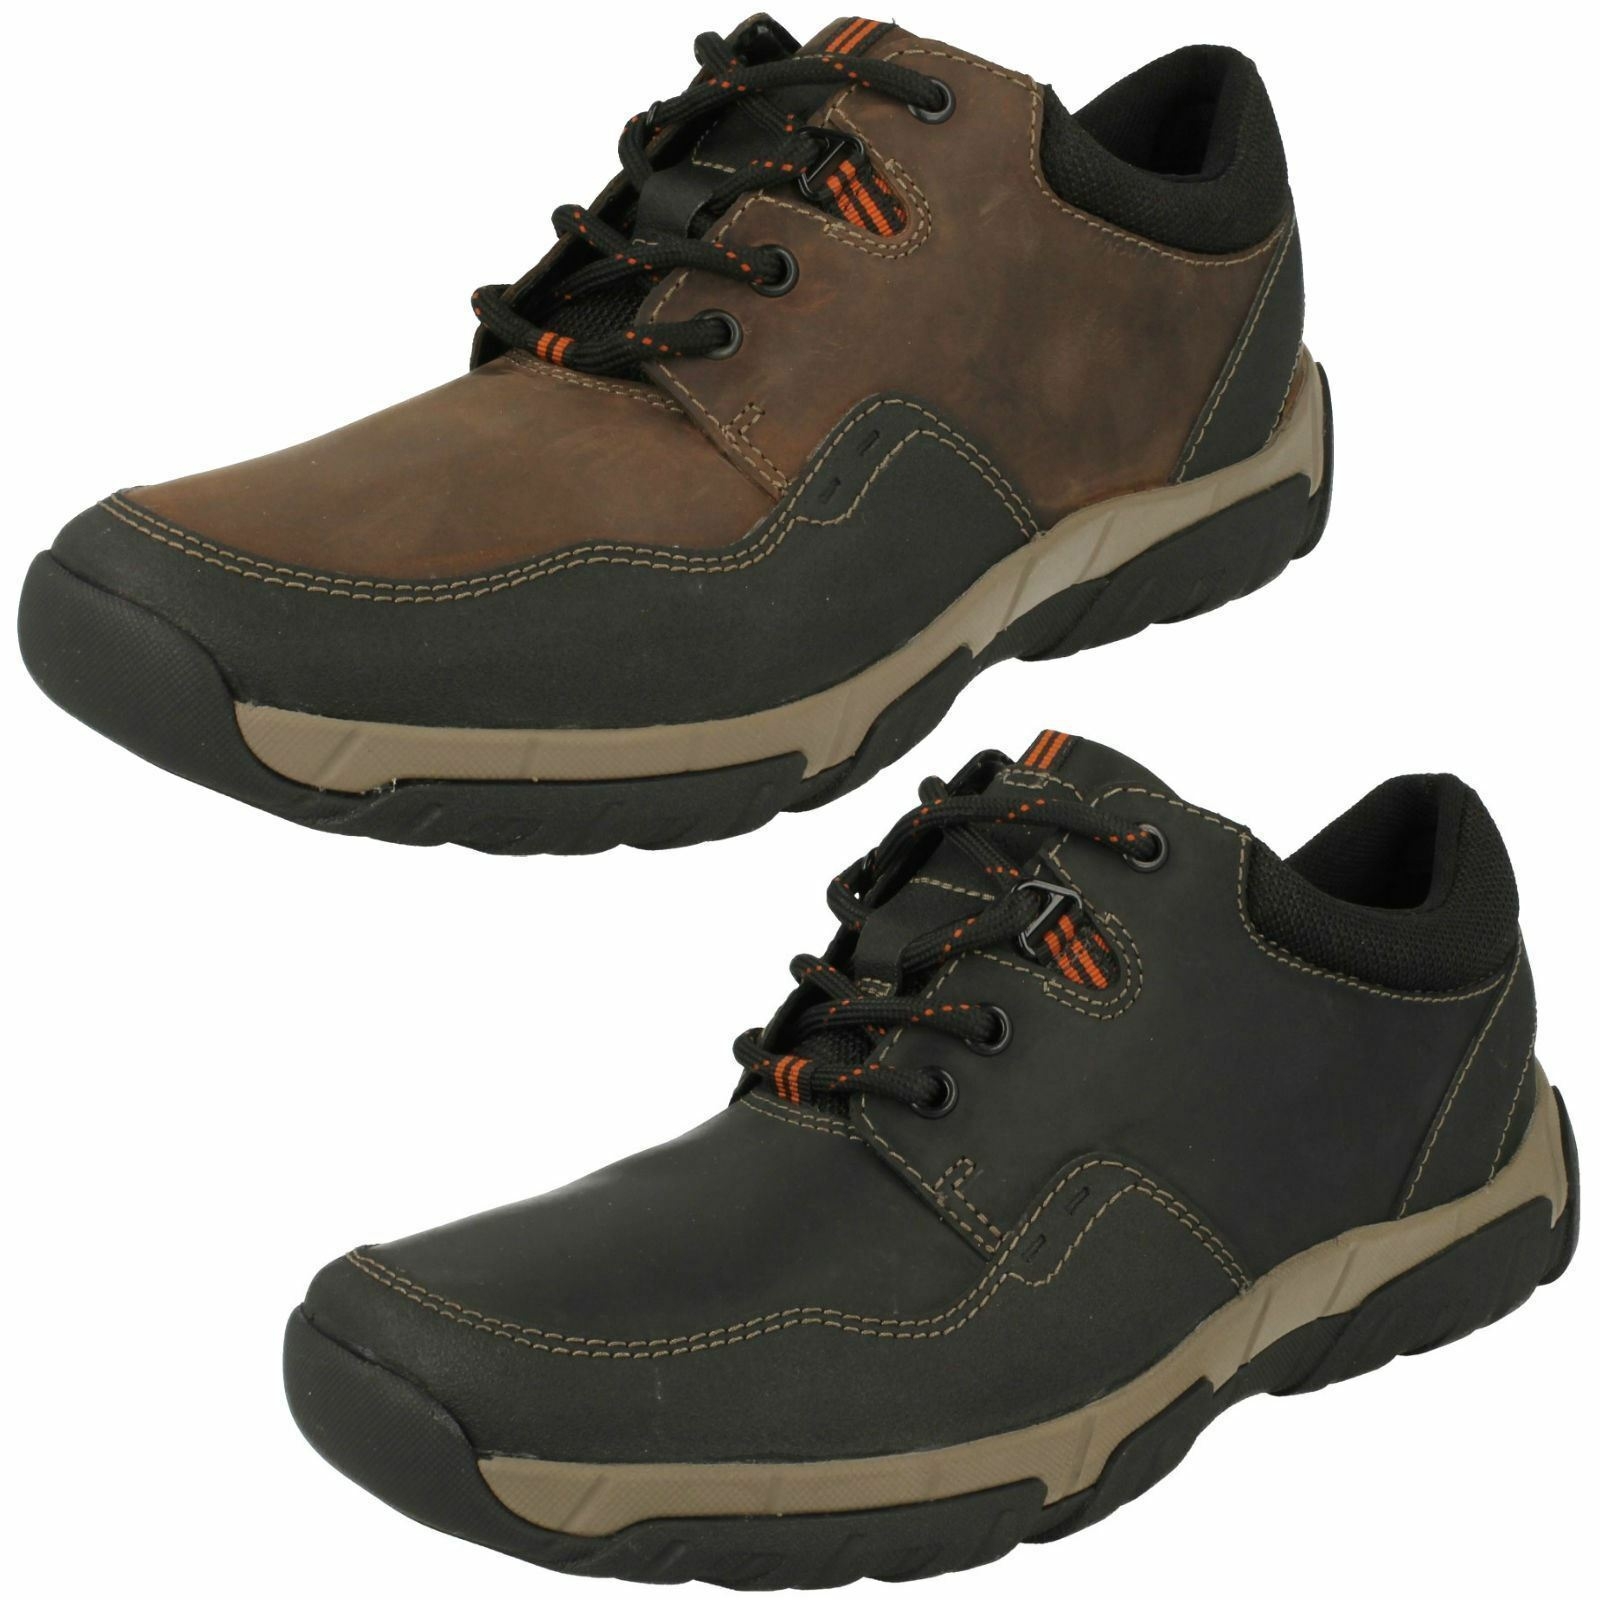 Hombre walbeck EDGE NEGRO / de Piel Marrón Impermeable Zapatos de / Clarks Venta e45d33